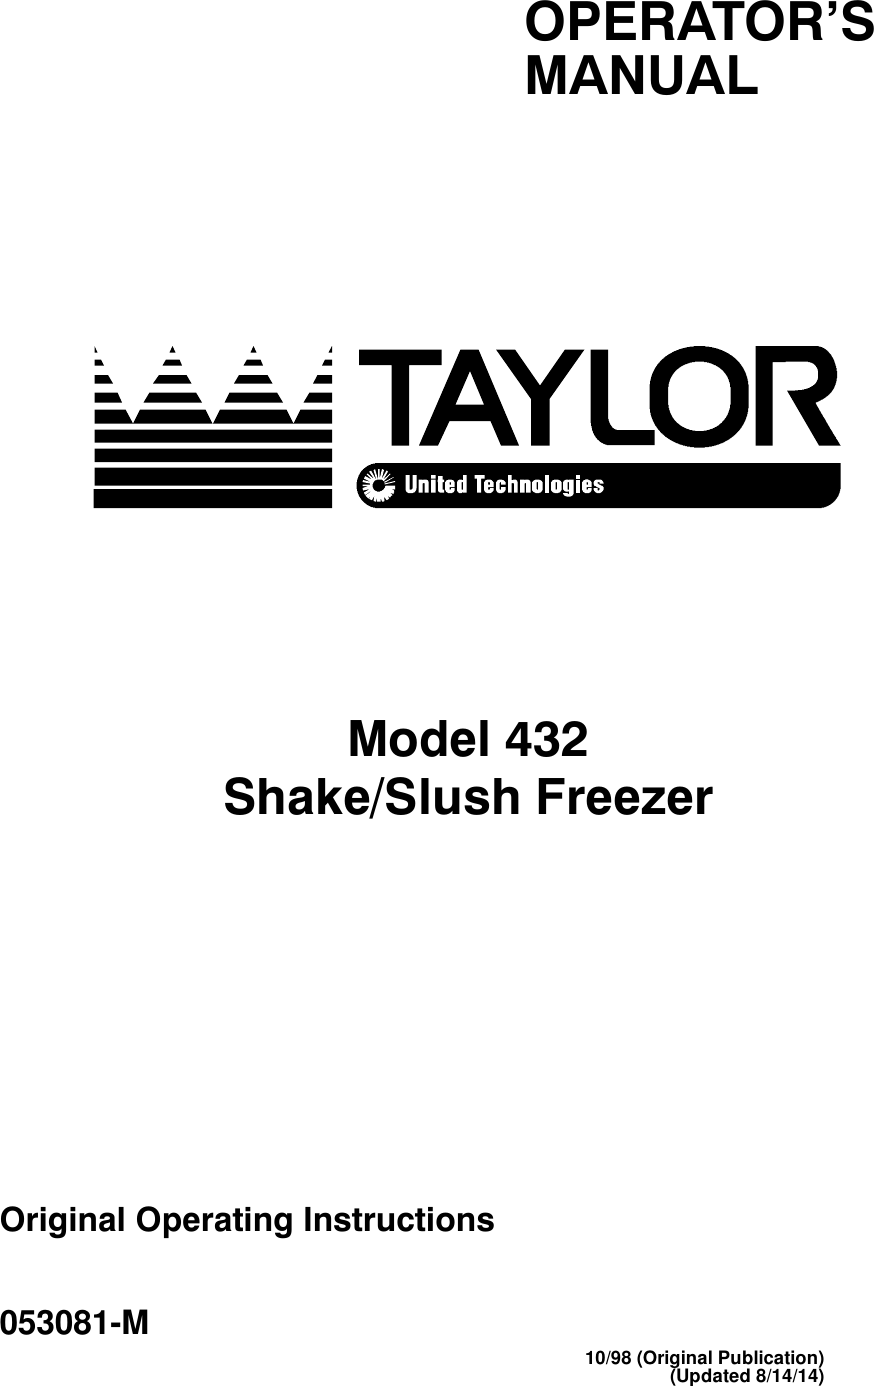 Taylor Blender Shake Slush Freezer Users Manual Fig1 Wiring Diagram For A Typical Fridge Compressor Note The Over